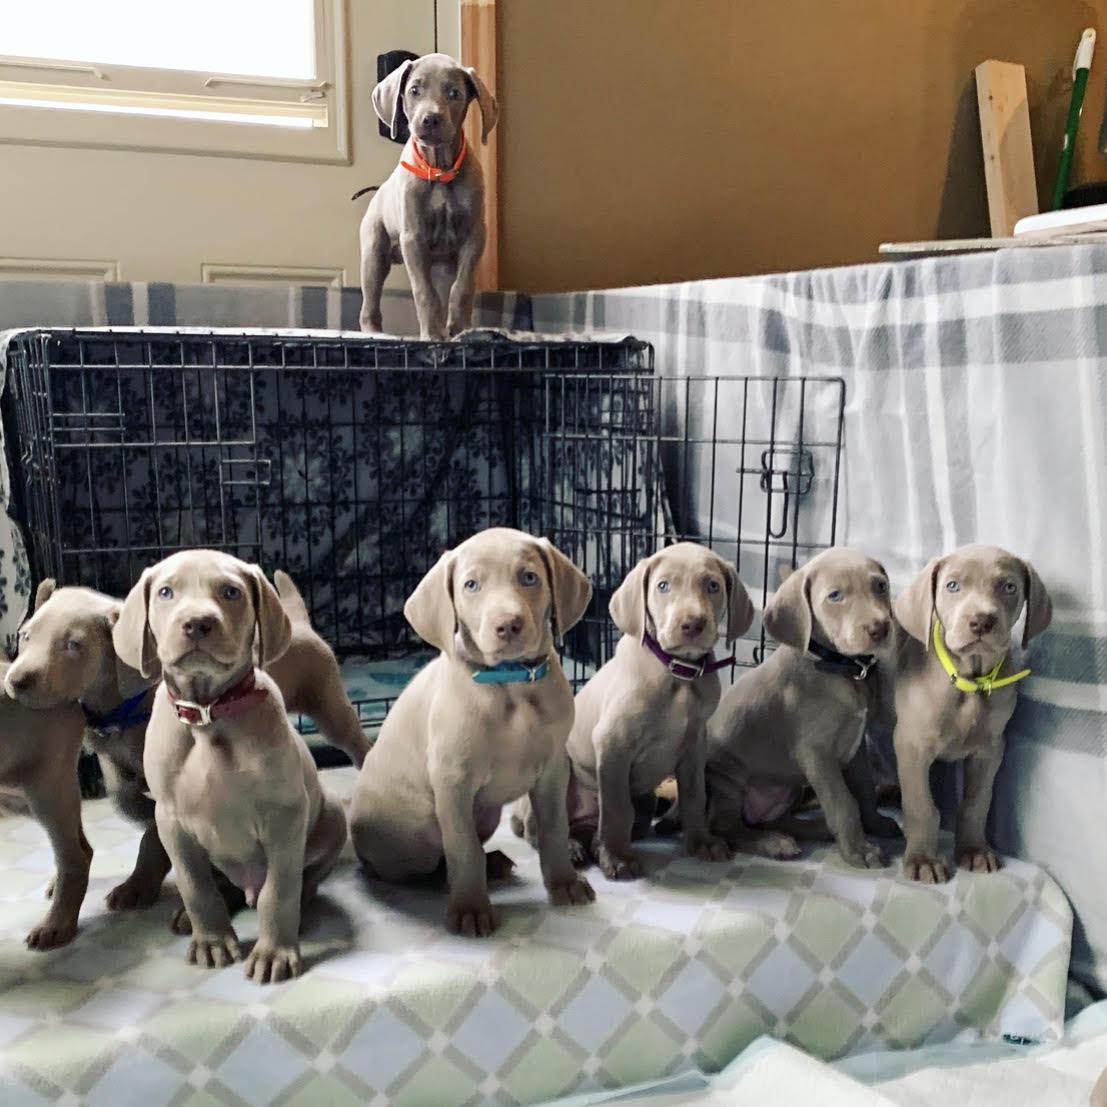 www.barrettweimaraners.com – 2019-05-27 – Gracie and Mango Puppies